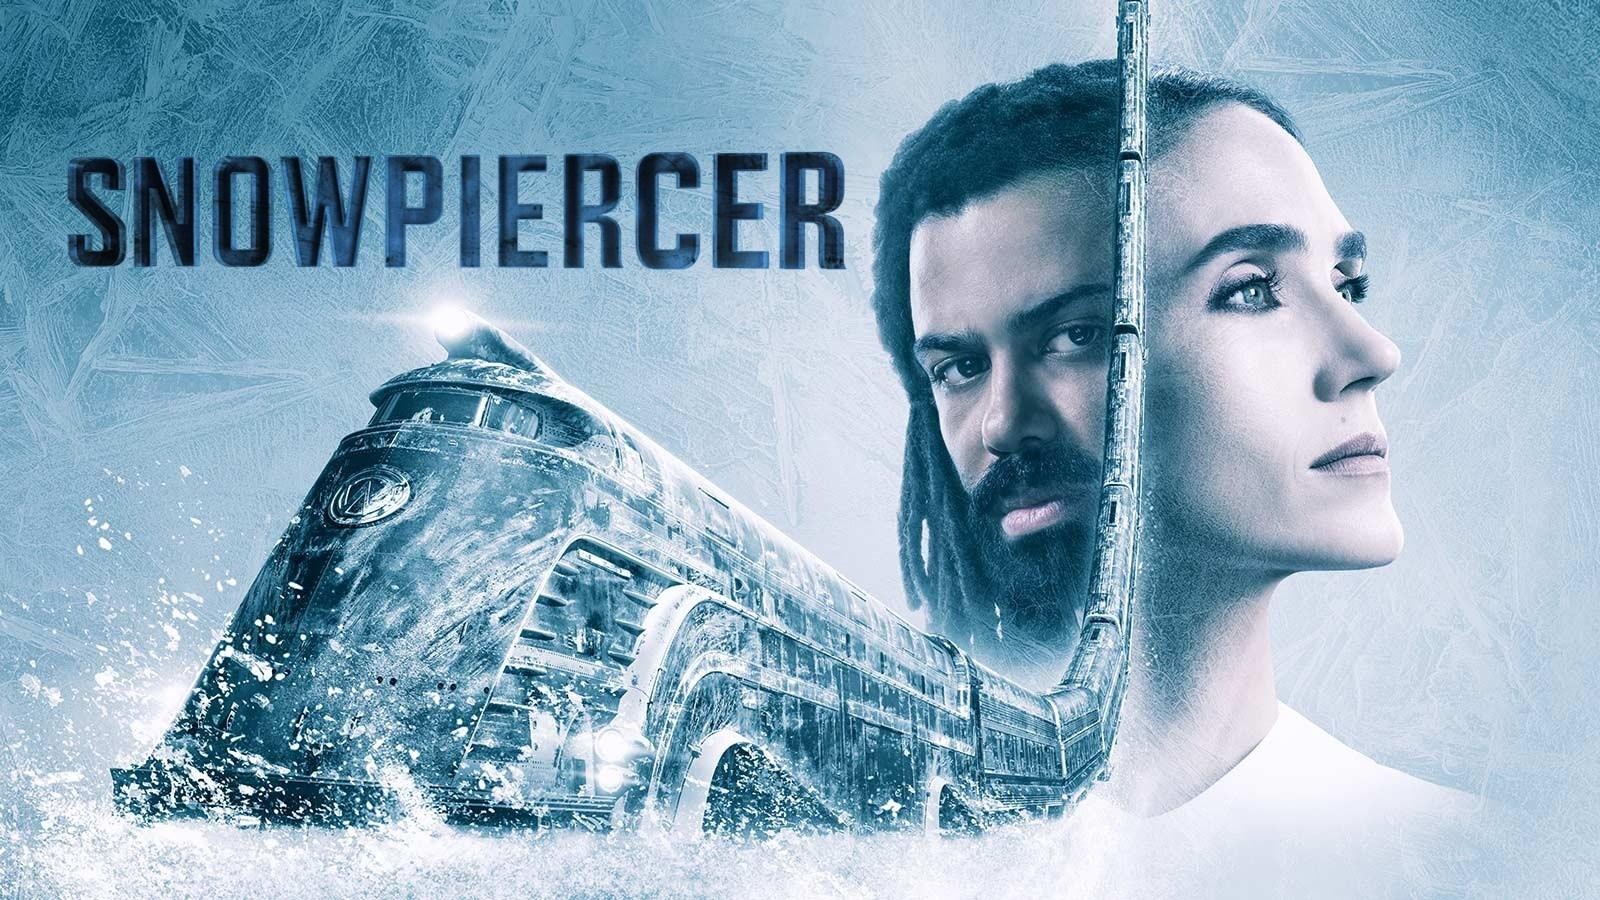 Voir Snowpiercer Streaming Vf 2020 Hd France Film Complet